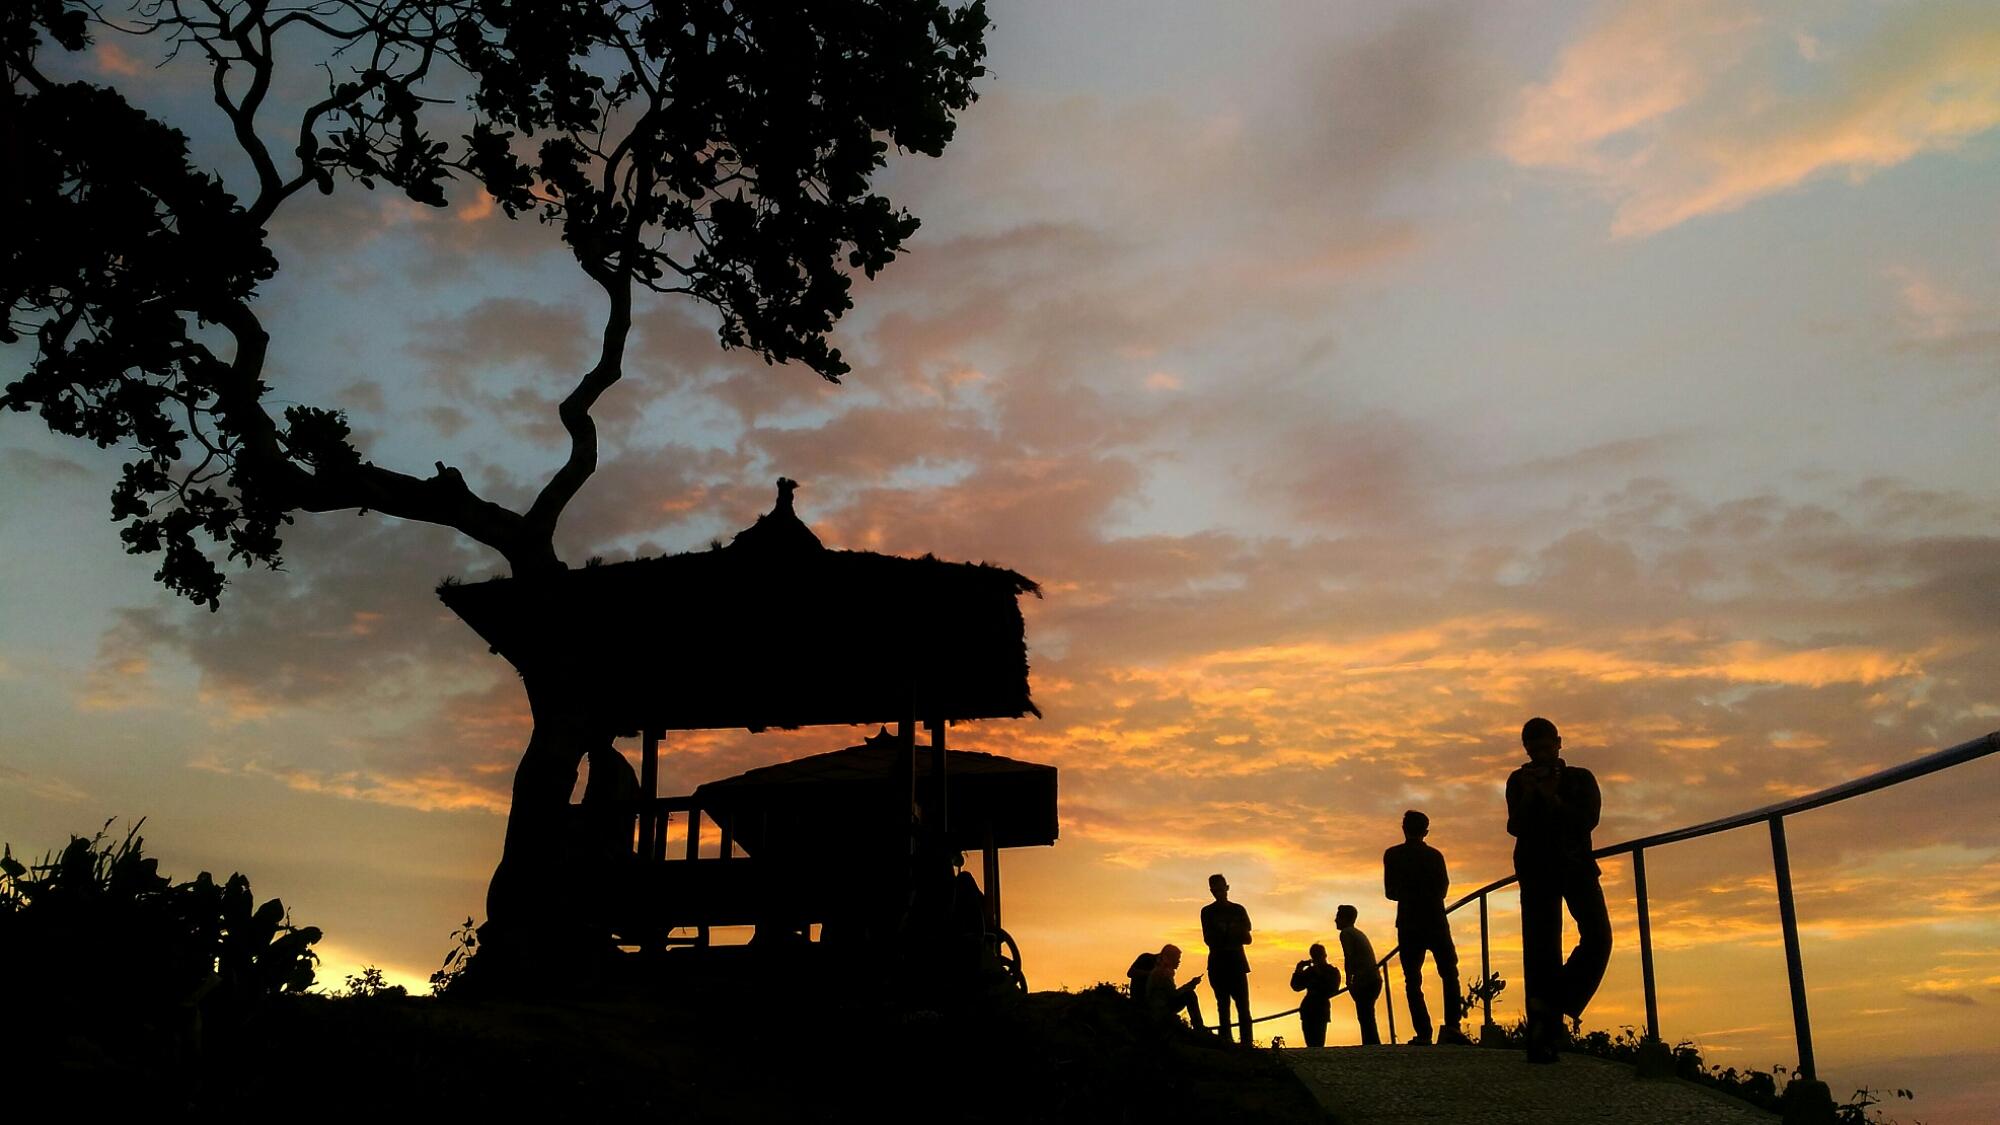 Wisata Green Village Gedangsari Yogyakarta Memberikan Pesona Alam Sunset Desa